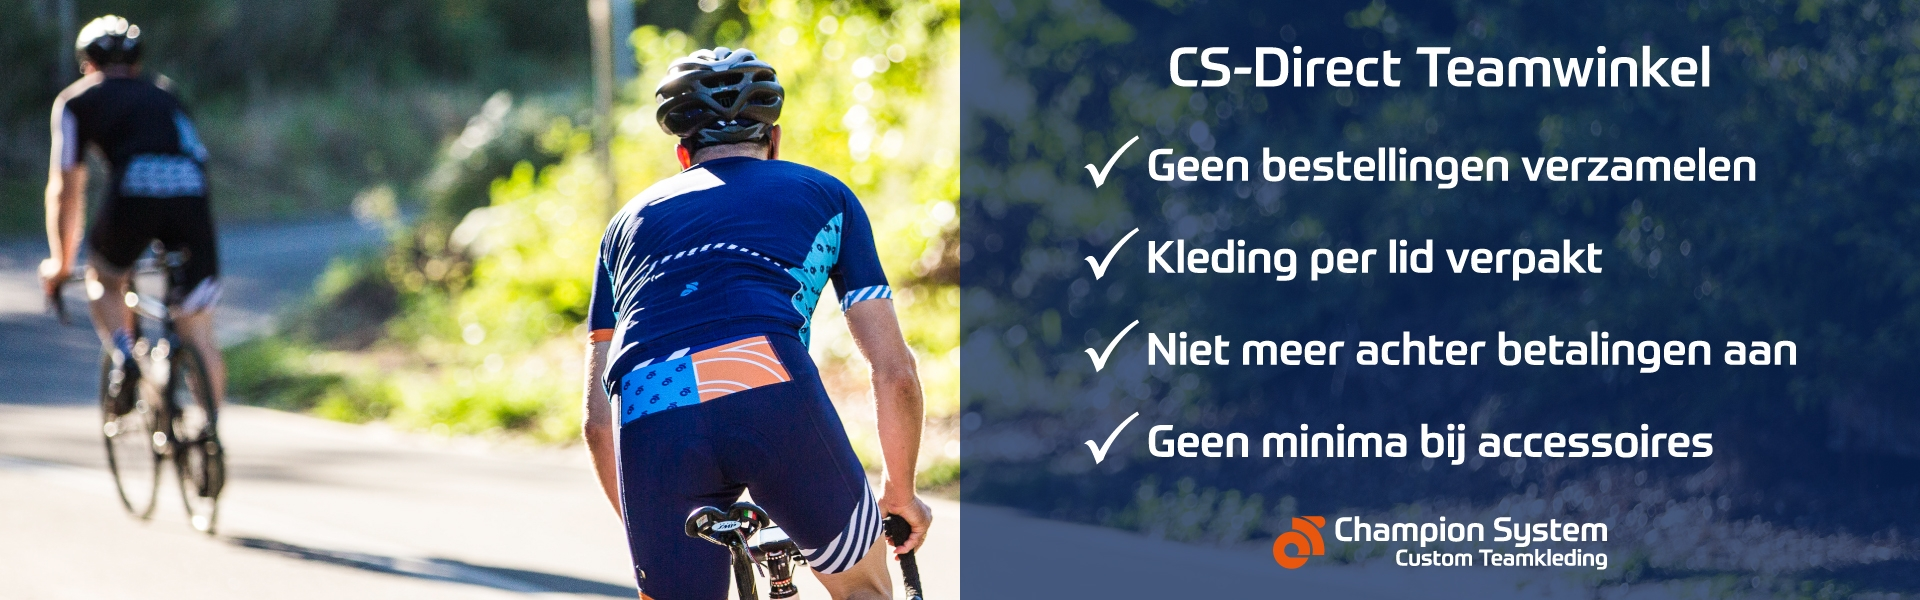 CS Direct teamwinkel